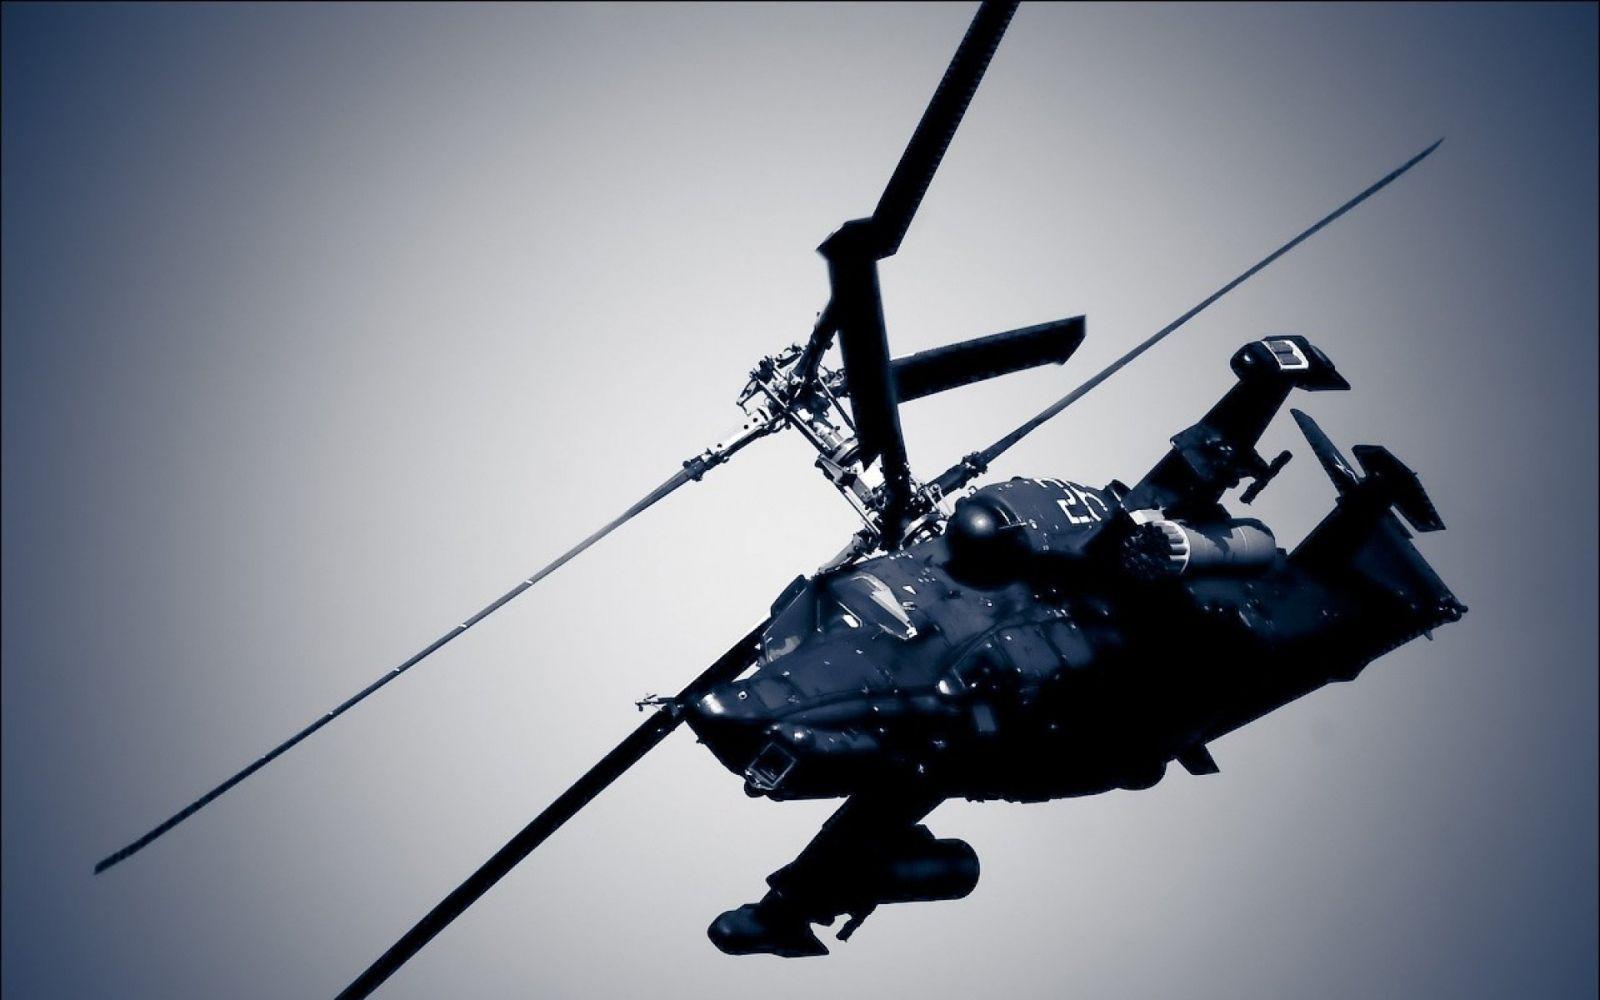 Black shark helicopter